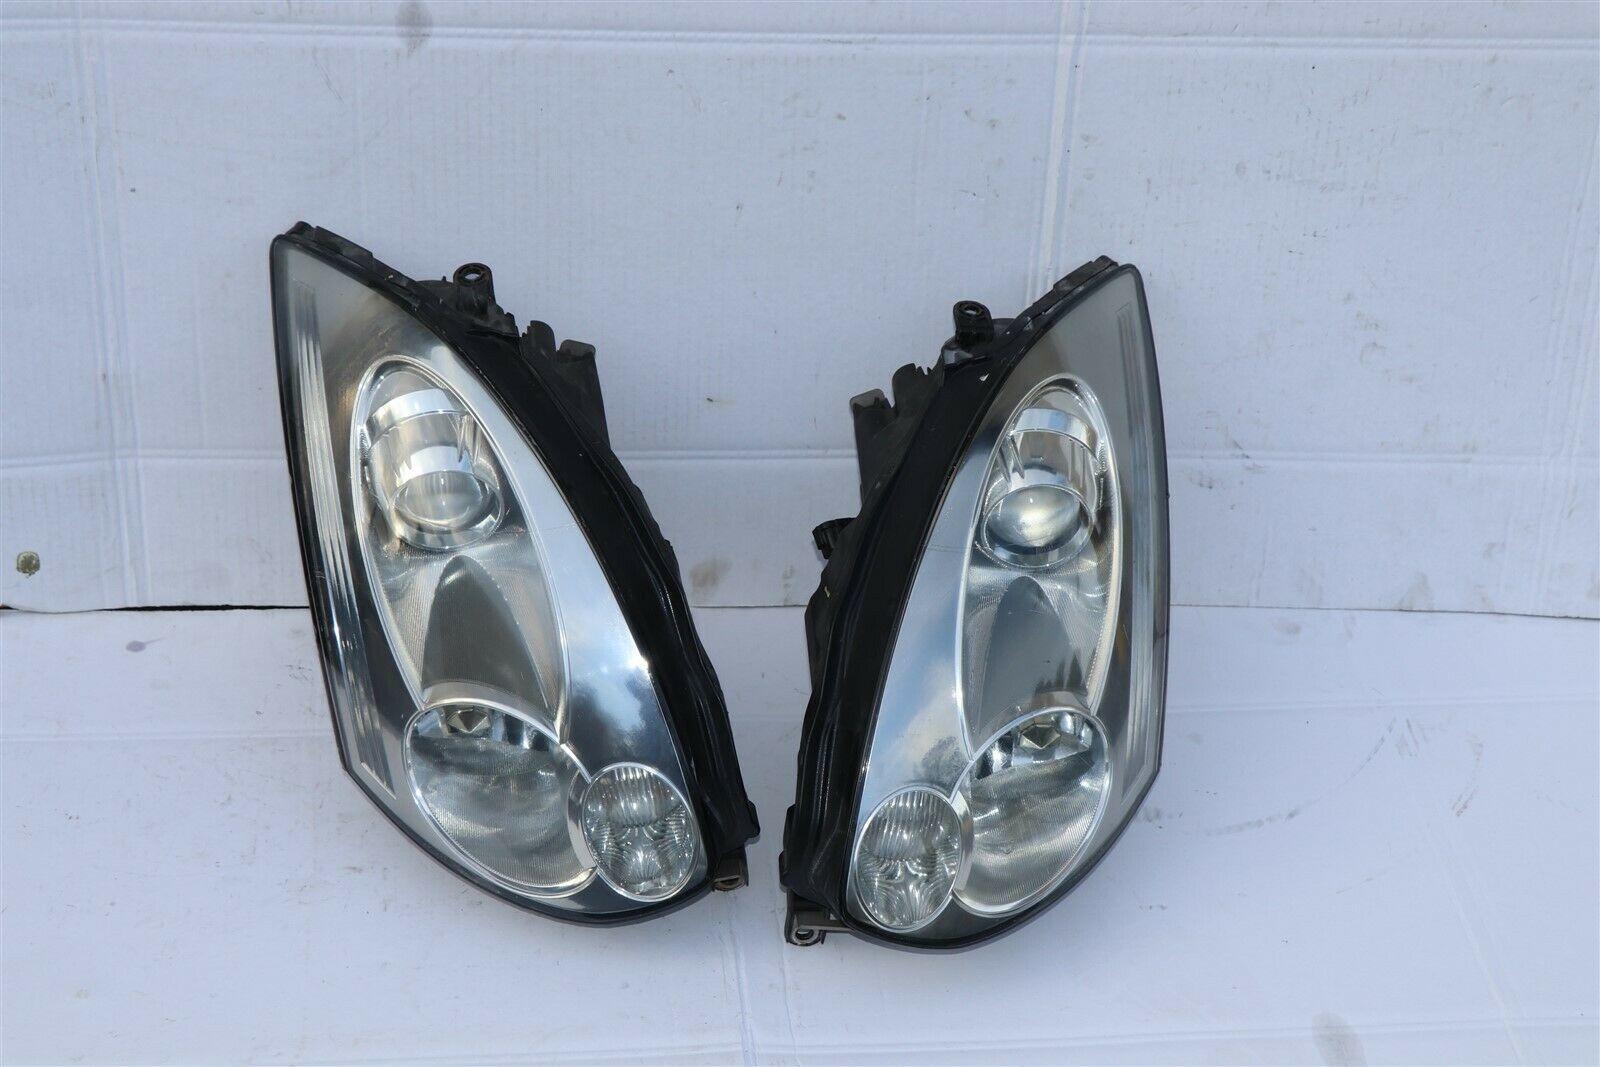 06-07 Infiniti G35 2dr Coupe HID Xenon HeadLight Head Light Lamp Set L&R